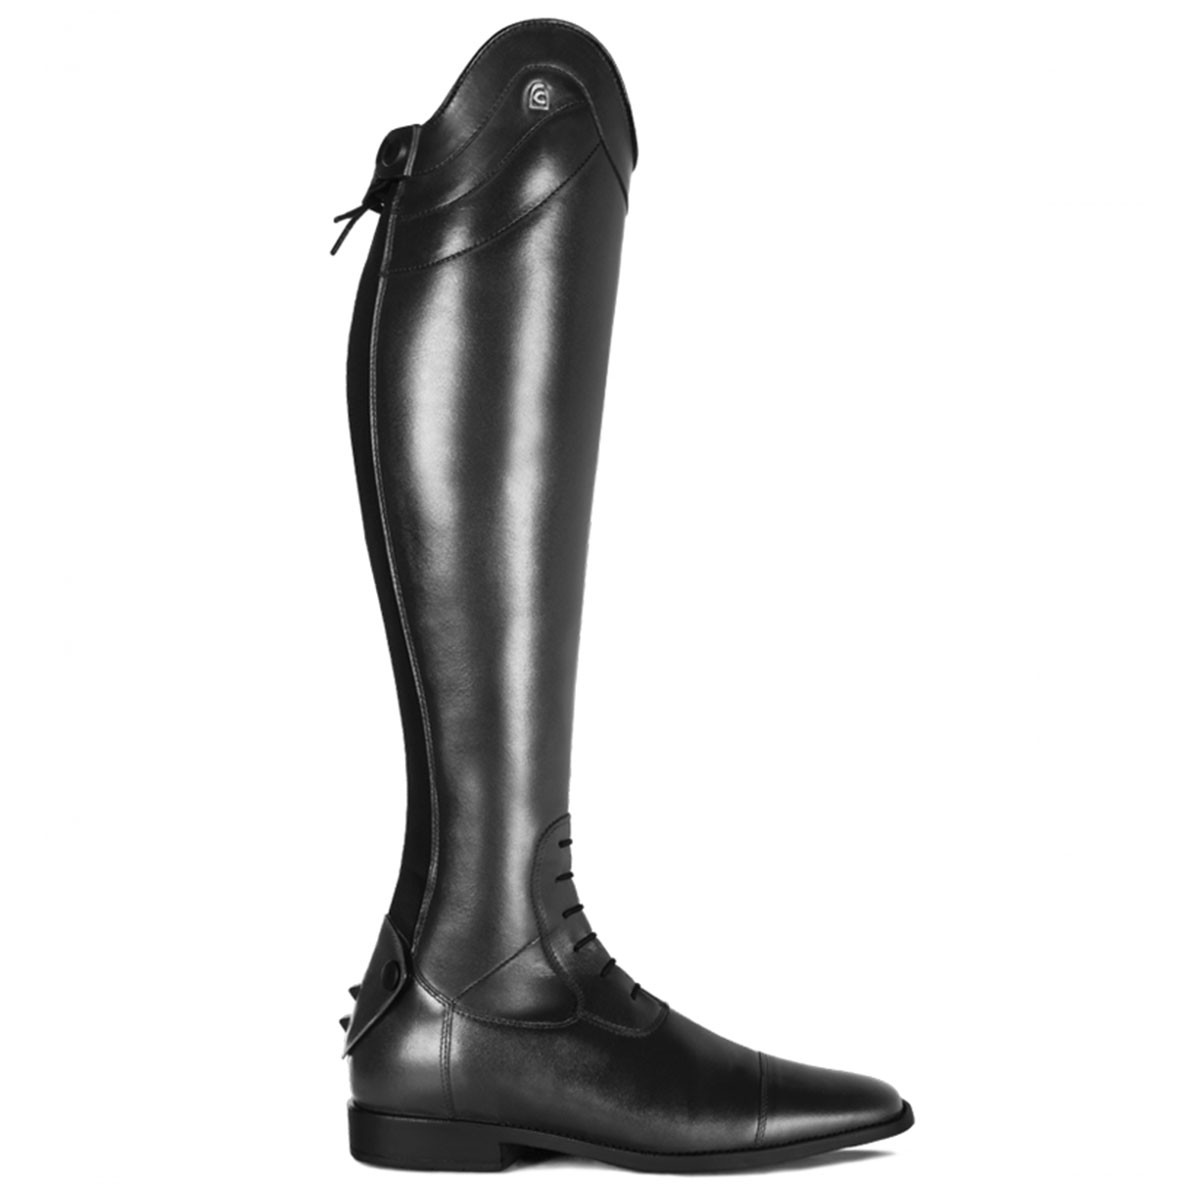 Cavallo Linus Slim rijlaars zwart maat:6-6.5 / h49-w34